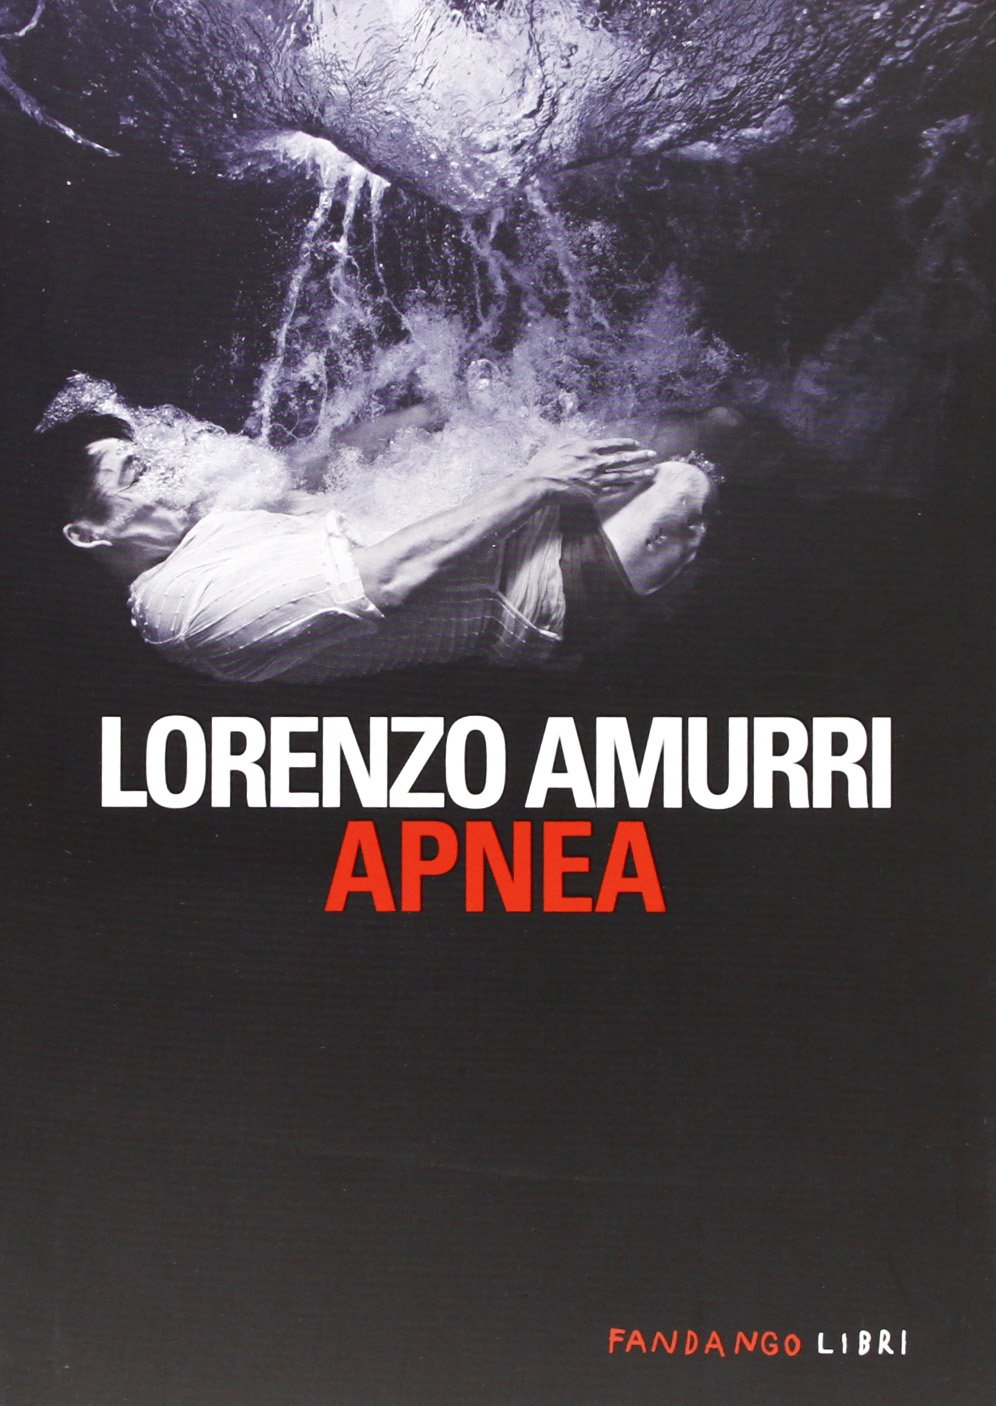 APNEA AMURRI EBOOK DOWNLOAD